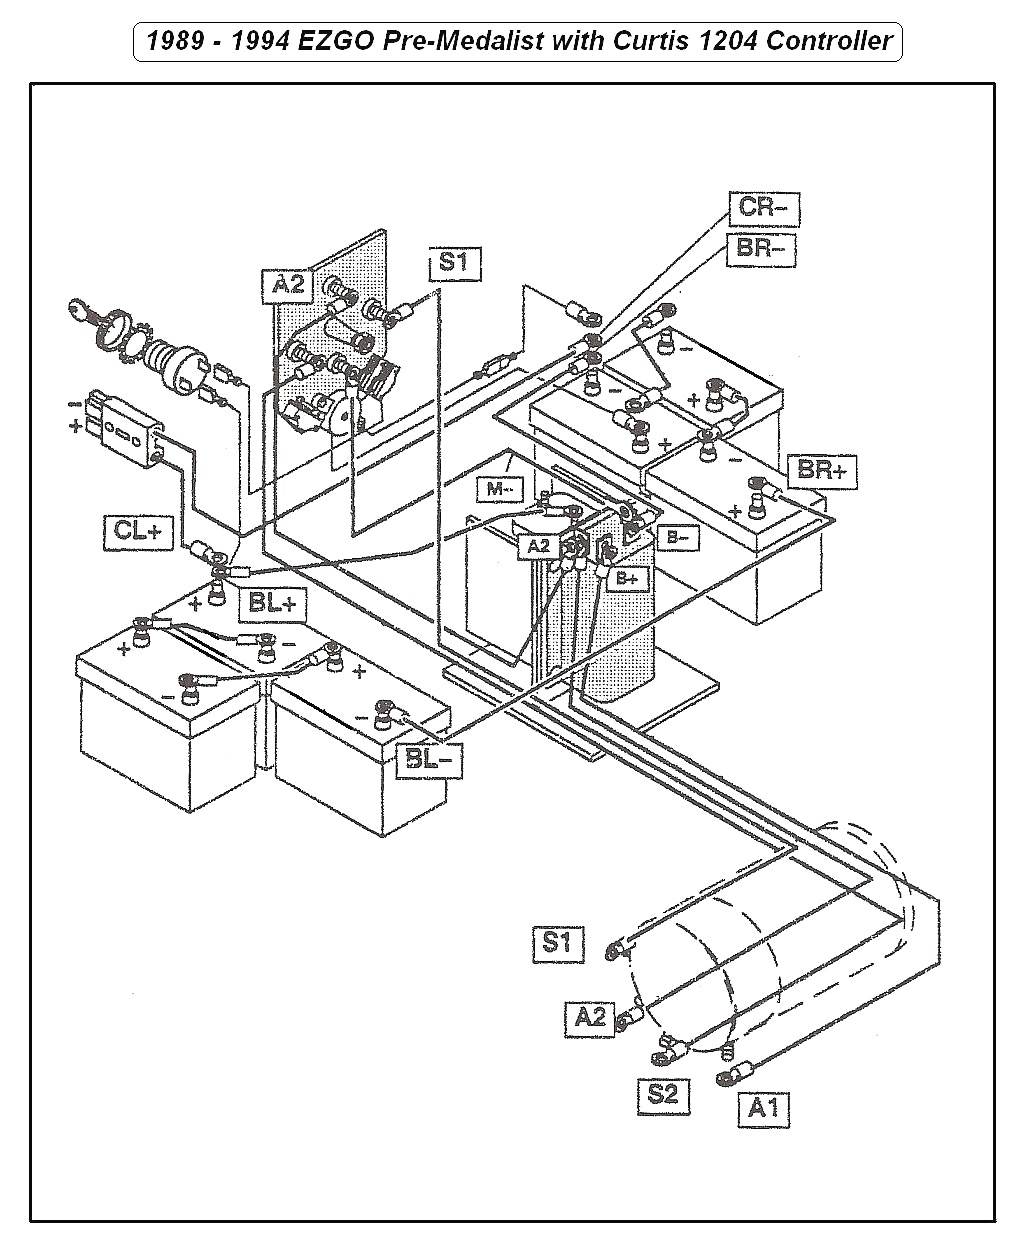 Ry 9325 Taylor Dunn 36 Volt Golf Cart Wiring Diagram On